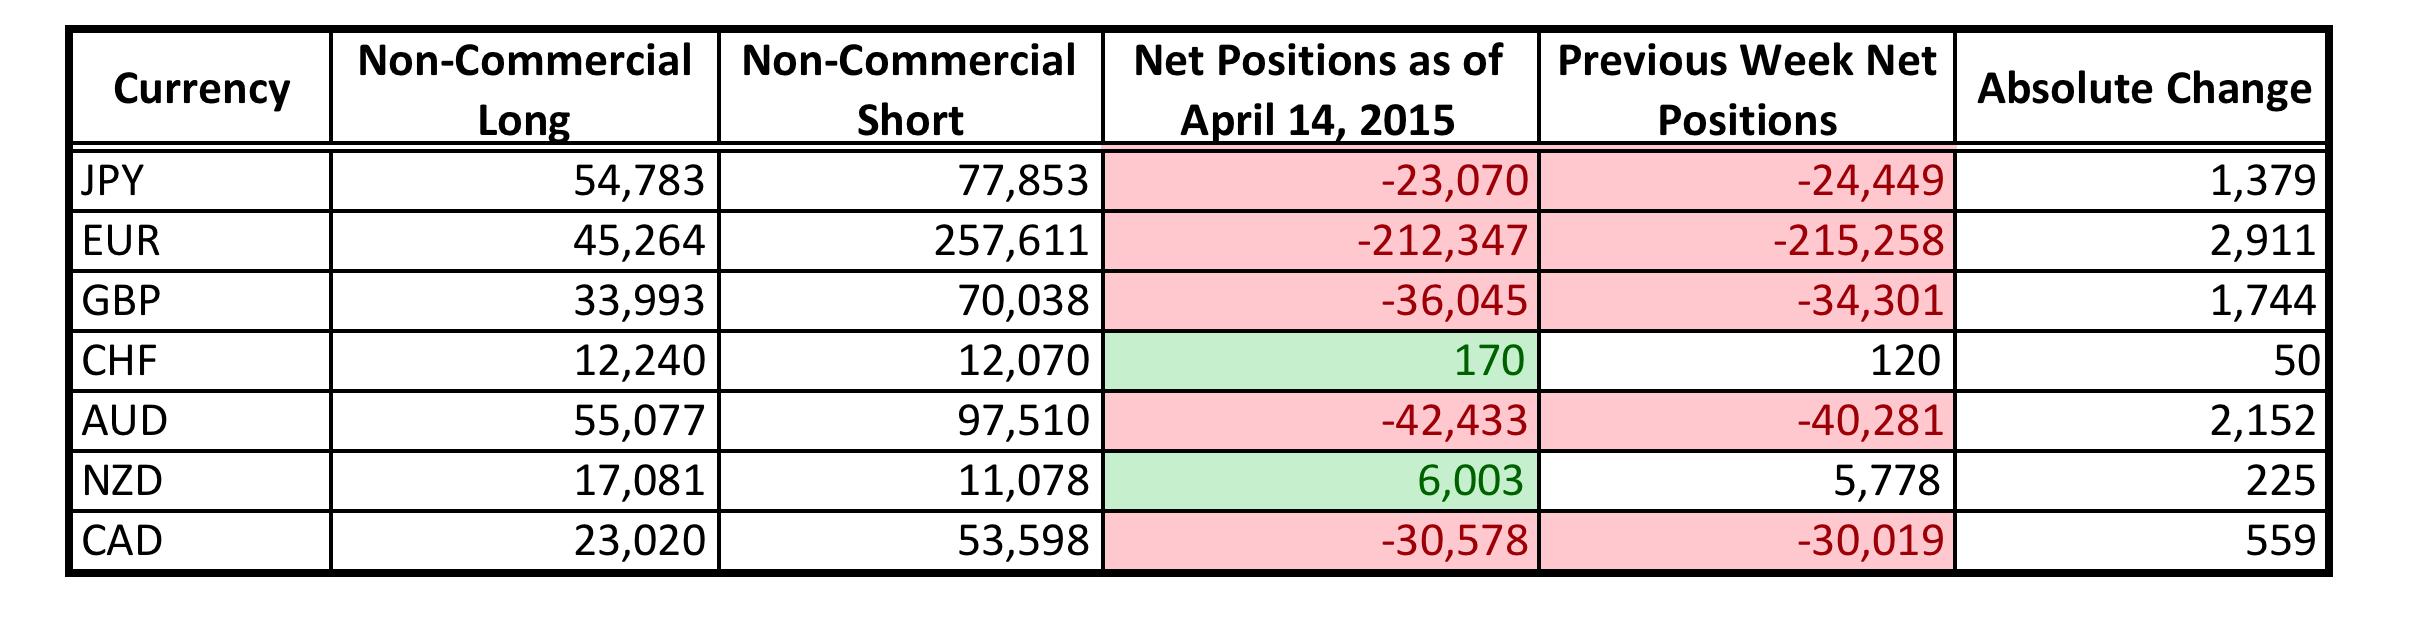 CFTC COT Positioning (April 14, 2015)